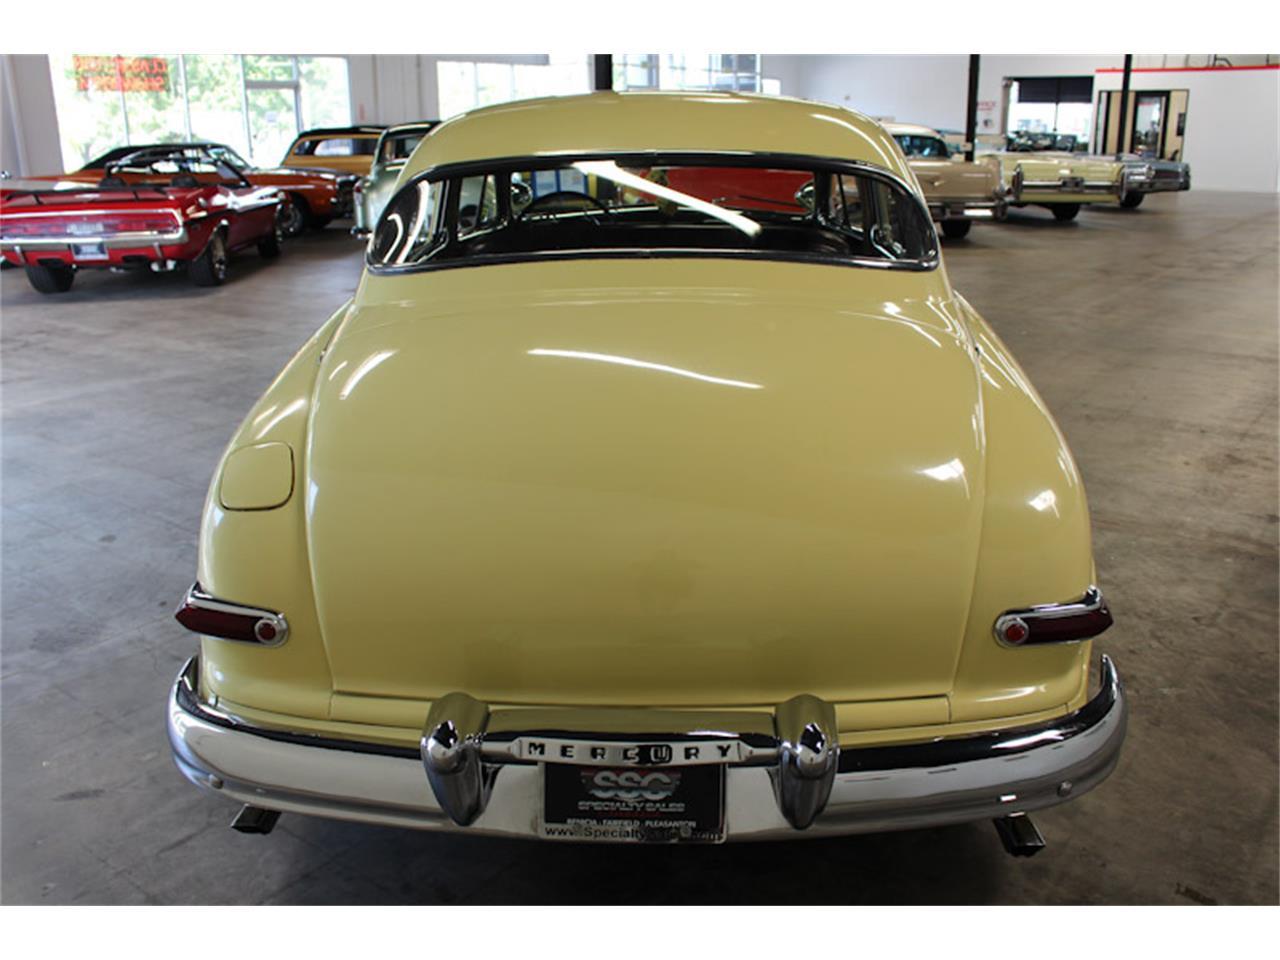 Large Picture of Classic 1950 Mercury Hot Rod located in California - OJFQ